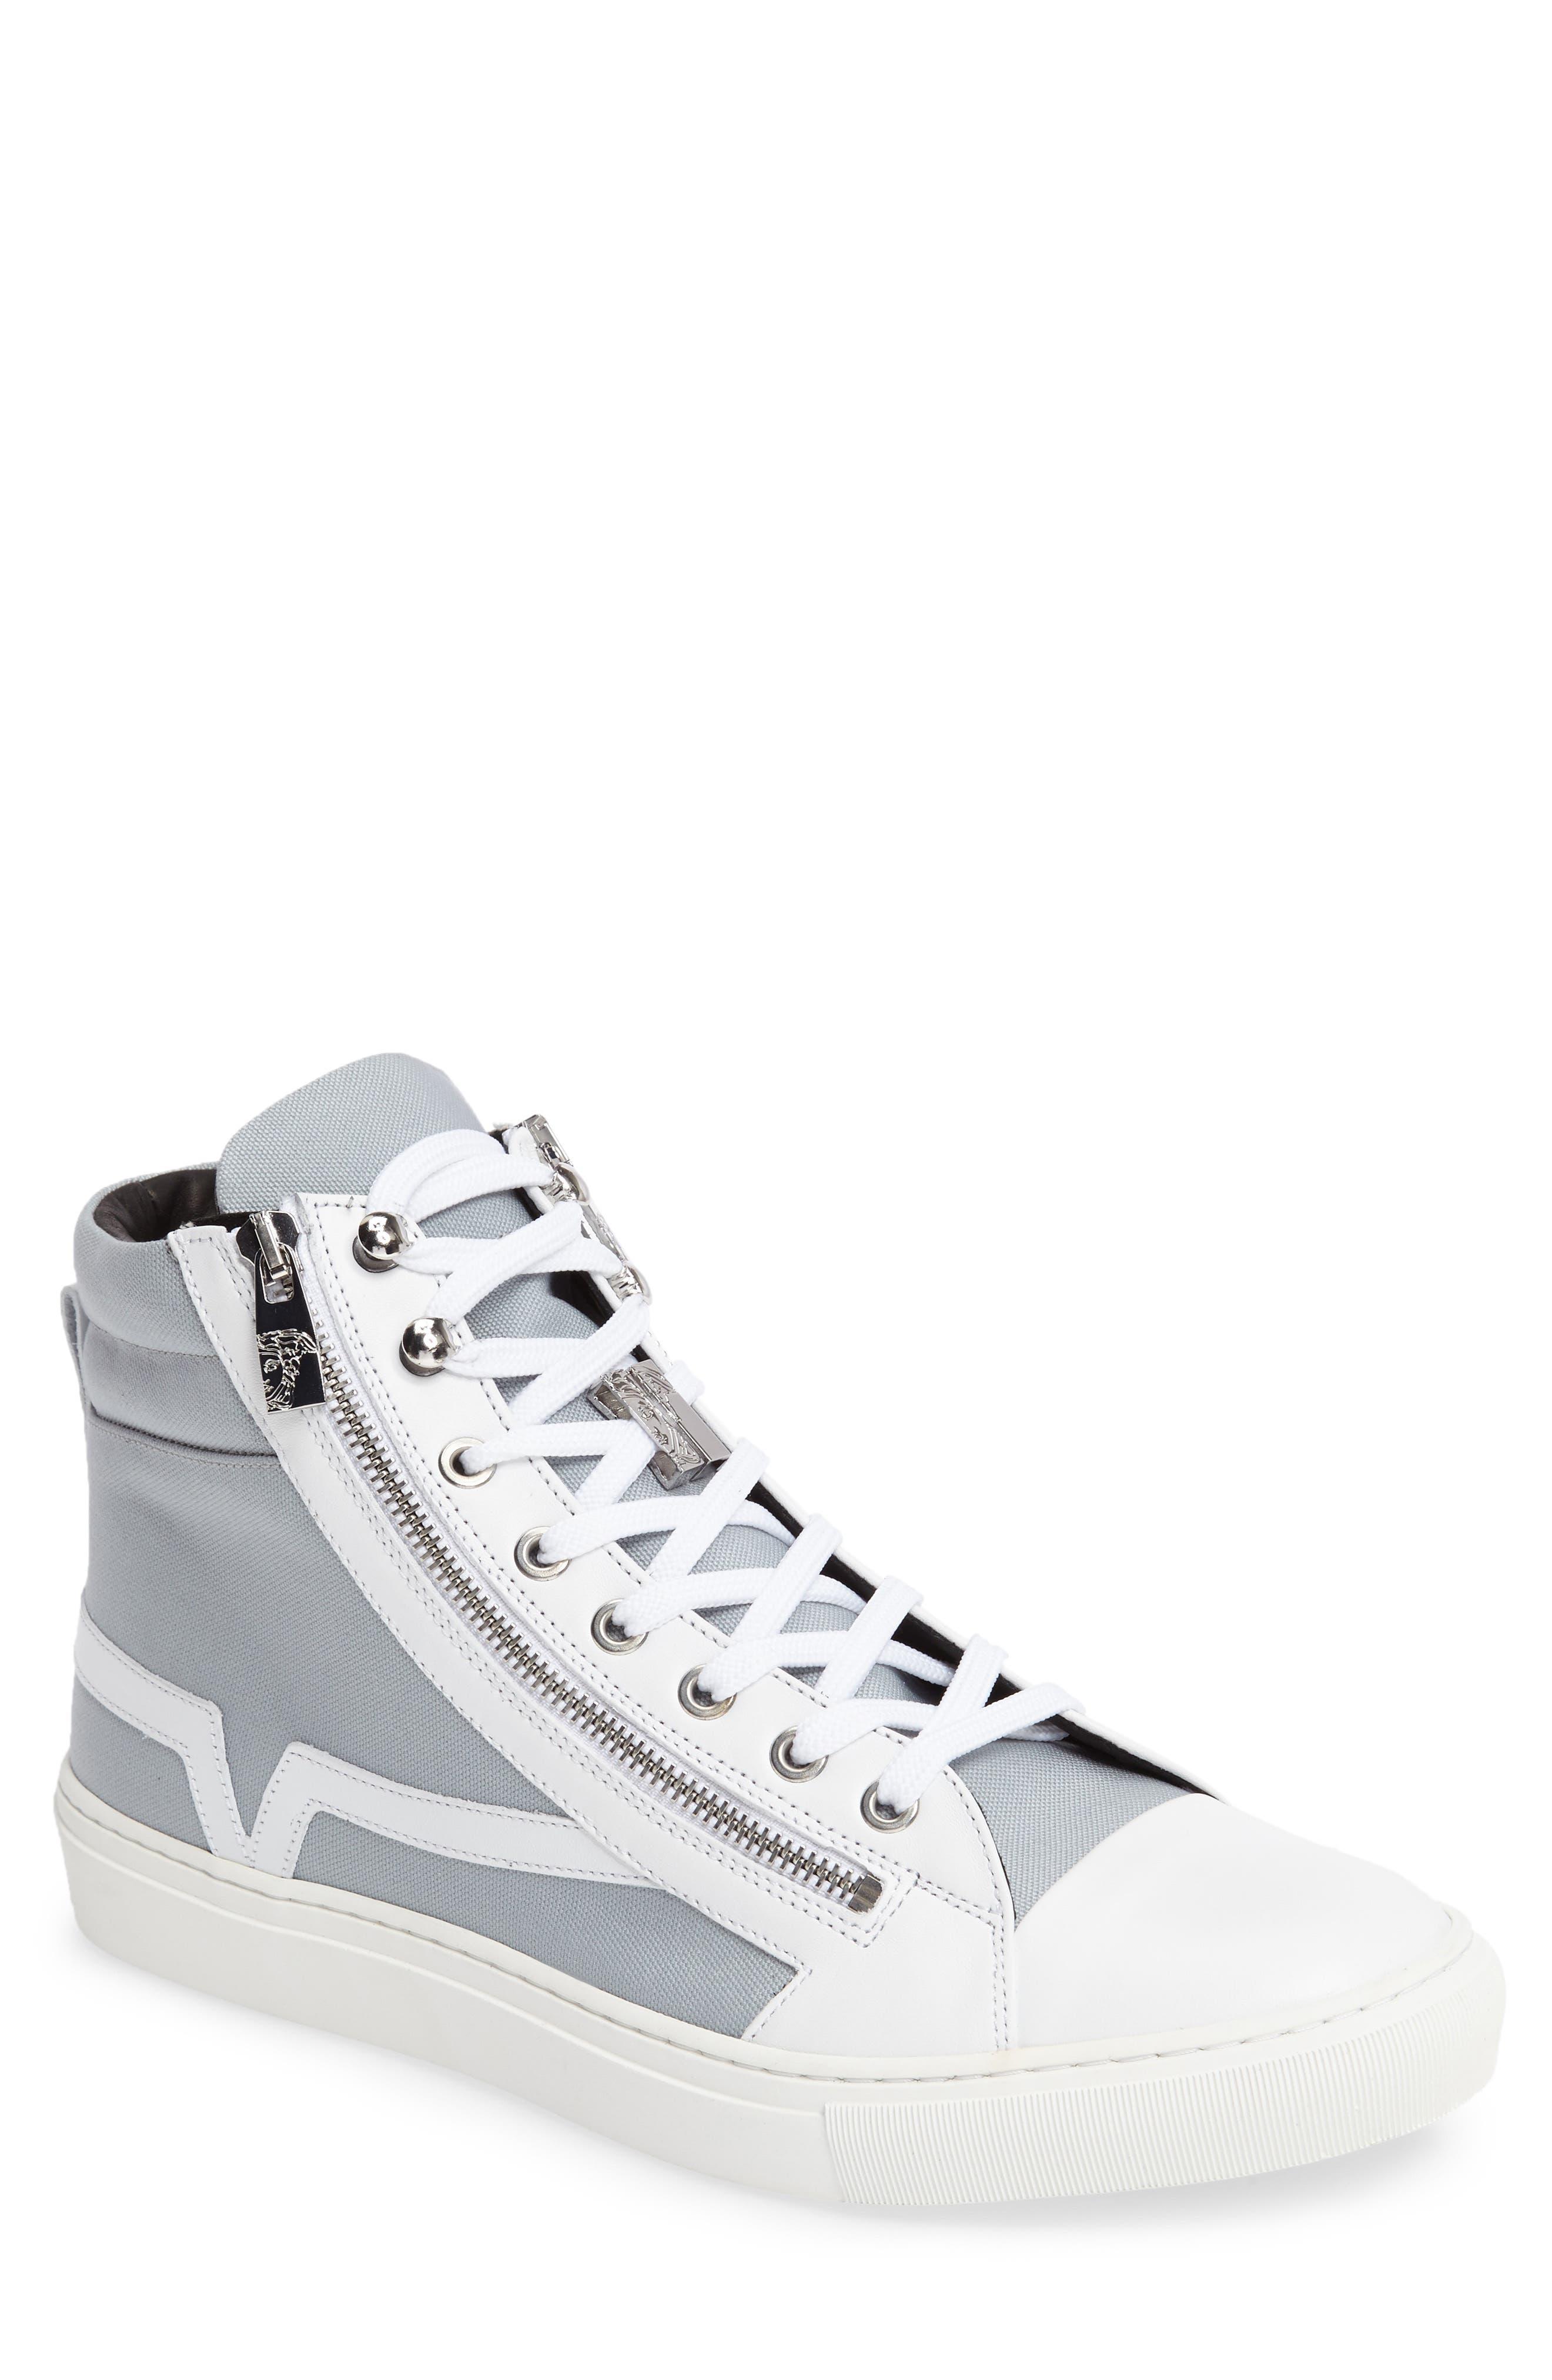 Versace Collection High Top Sneaker (Men)